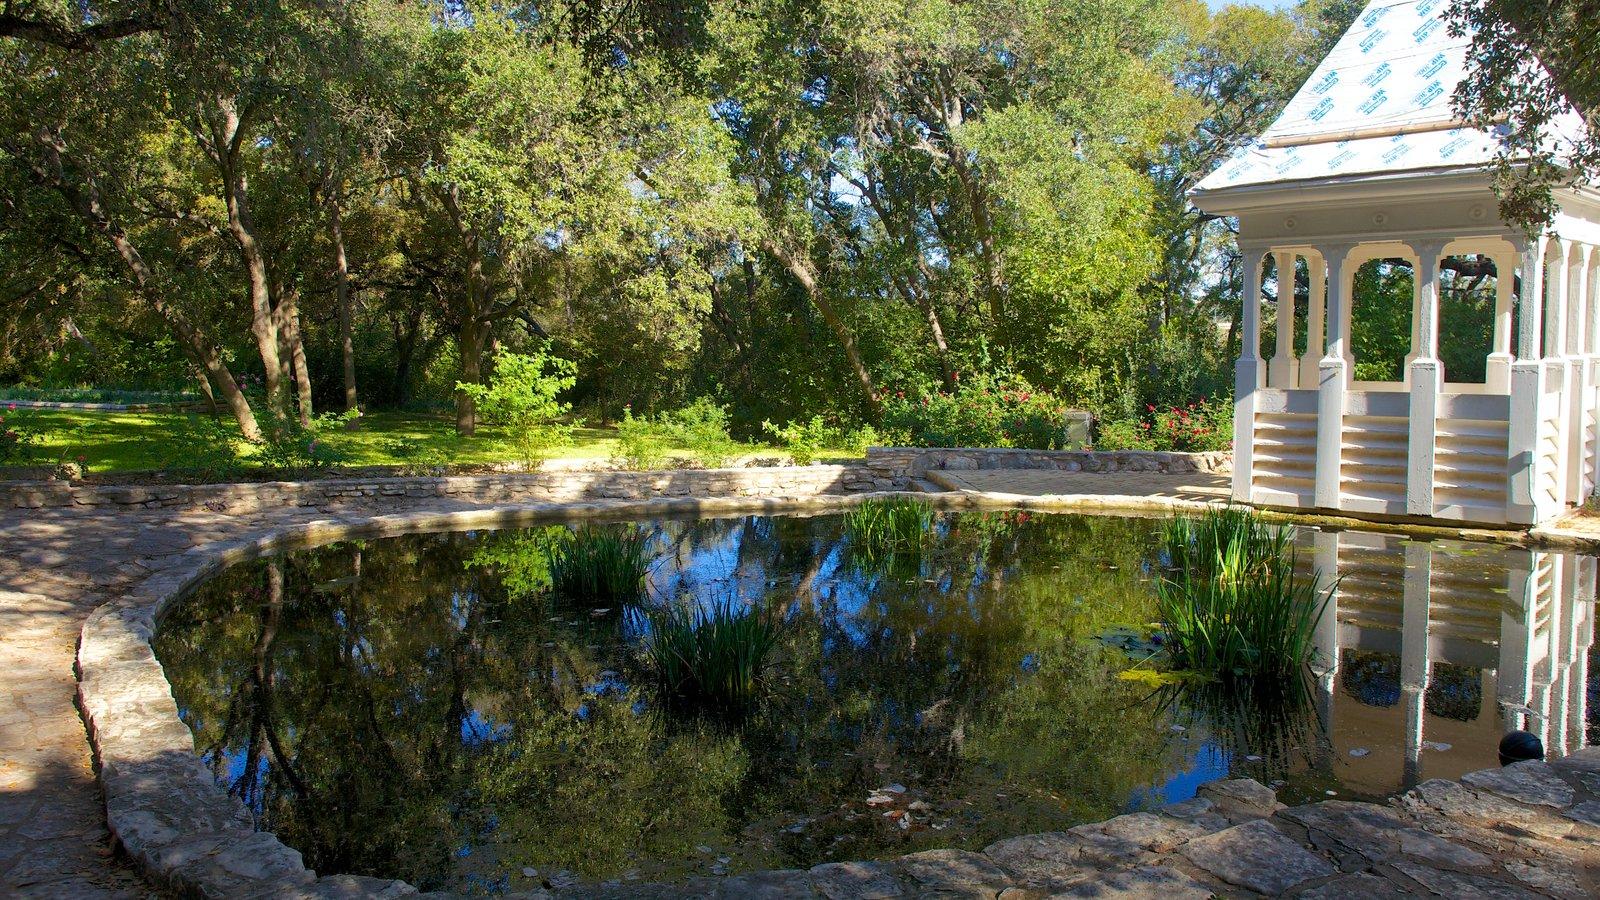 Charmant Zilker Botanical Garden Showing A Pond And A Garden